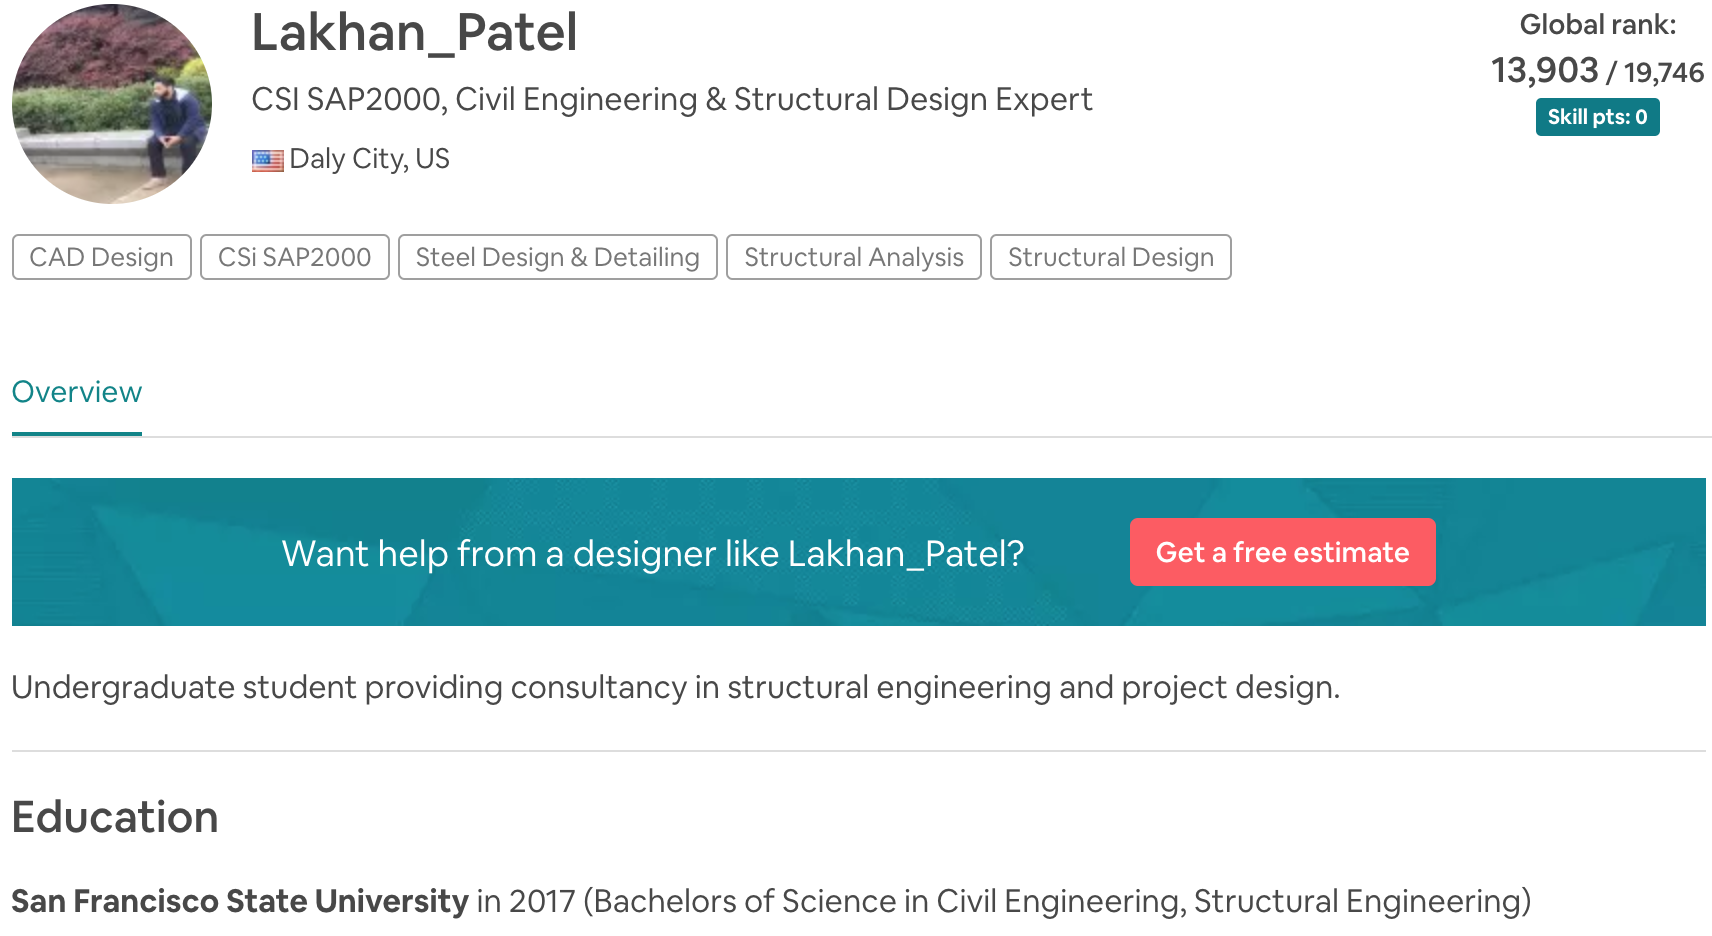 Lakhan_Patel CSI SAP2000, Civil Engineering & Structural Design Expert